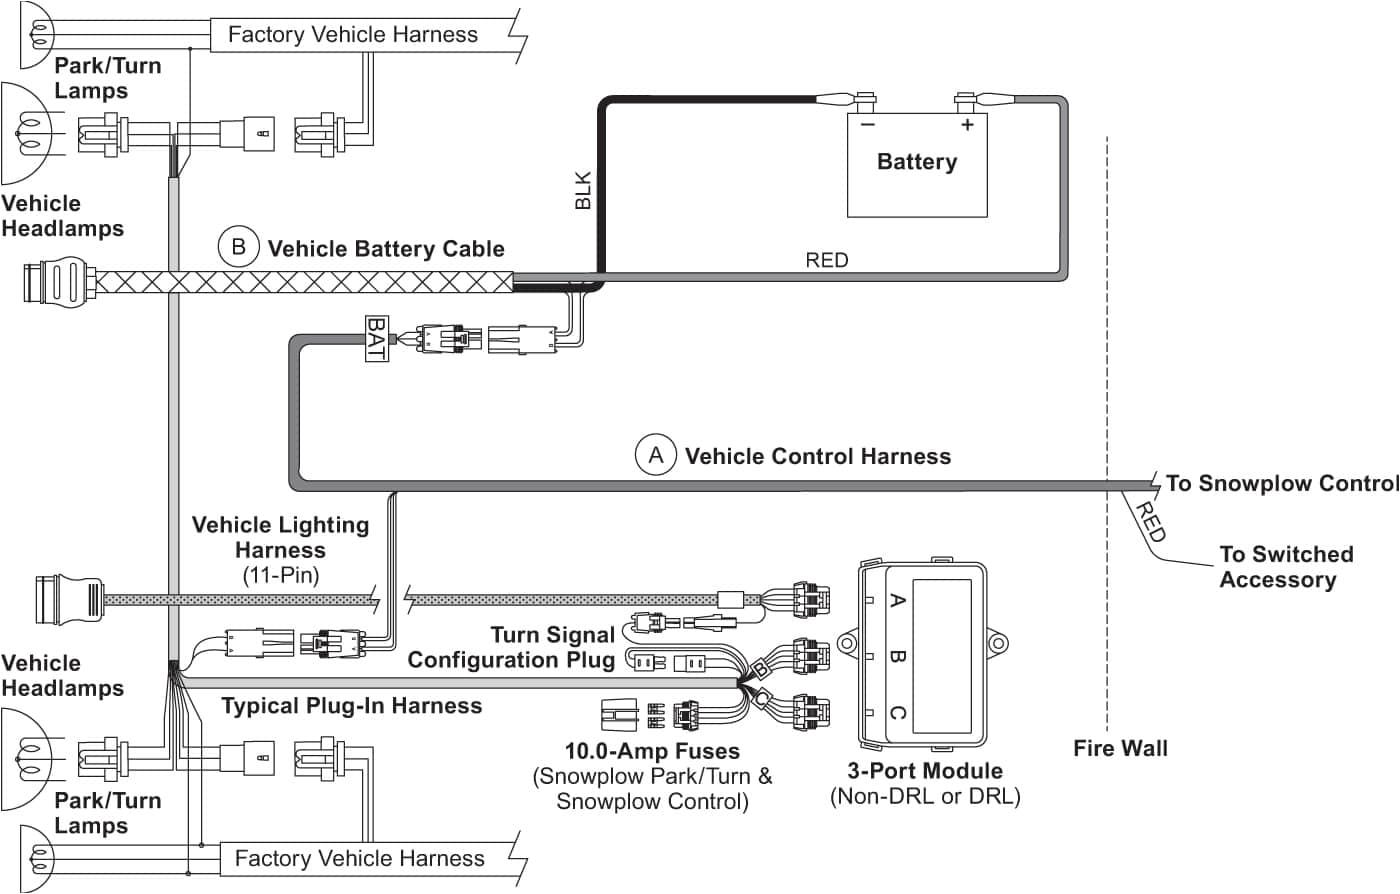 western plow unimount diagram wiring diagram blog 9 point western unimount wiring diagram